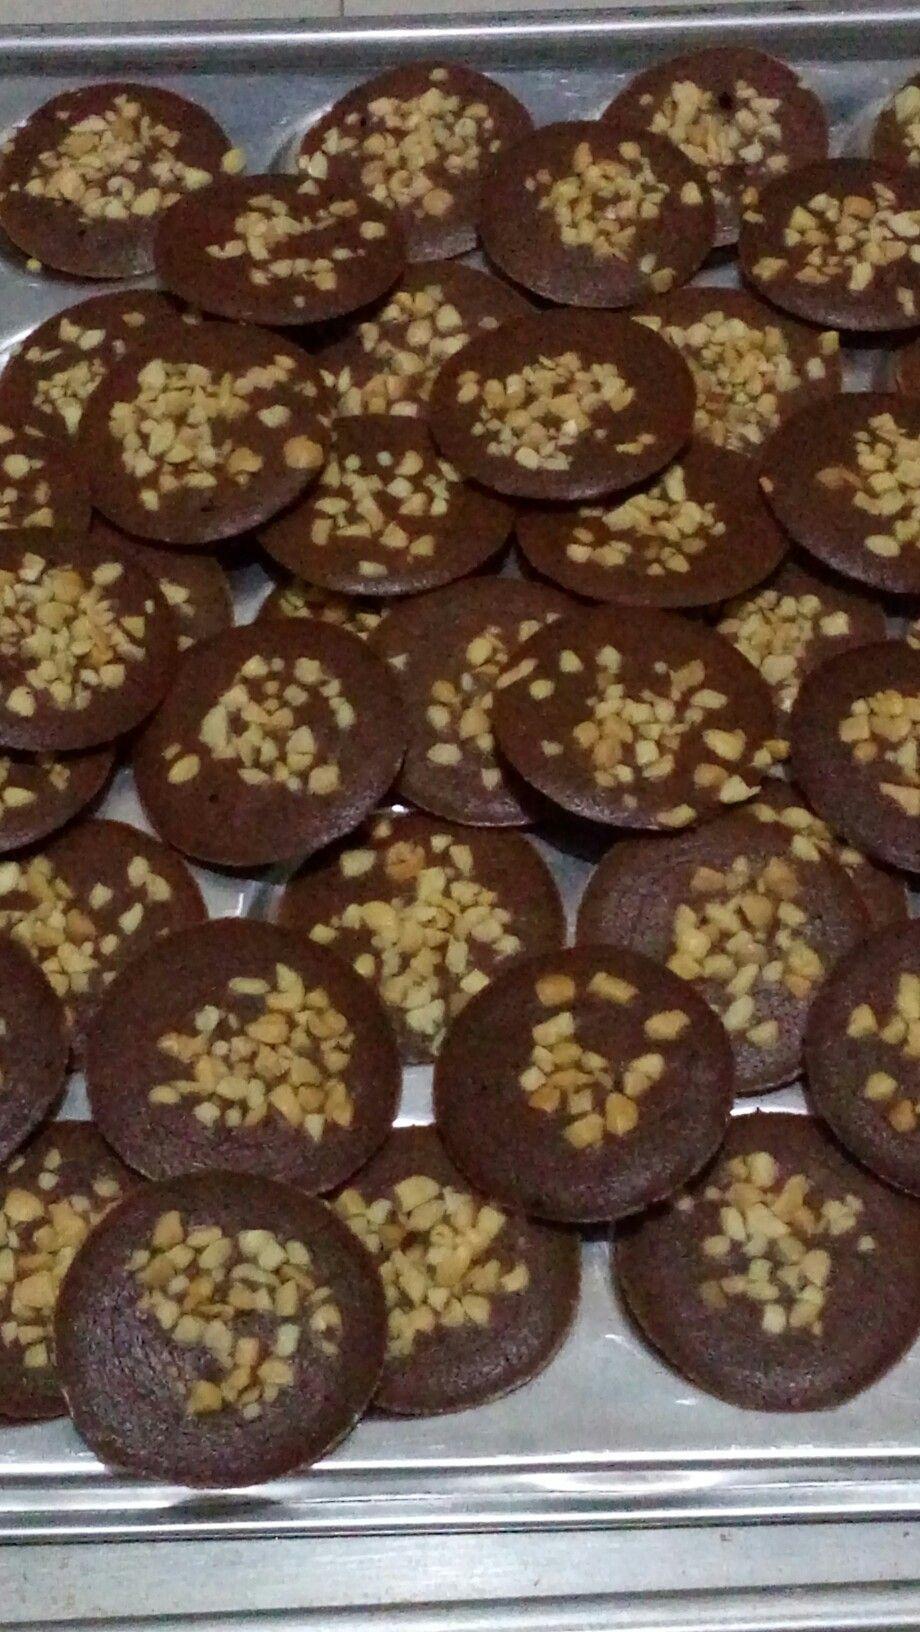 Lidah Kucing Coklat Kacang By D Rien Cake N Cookies Coklat